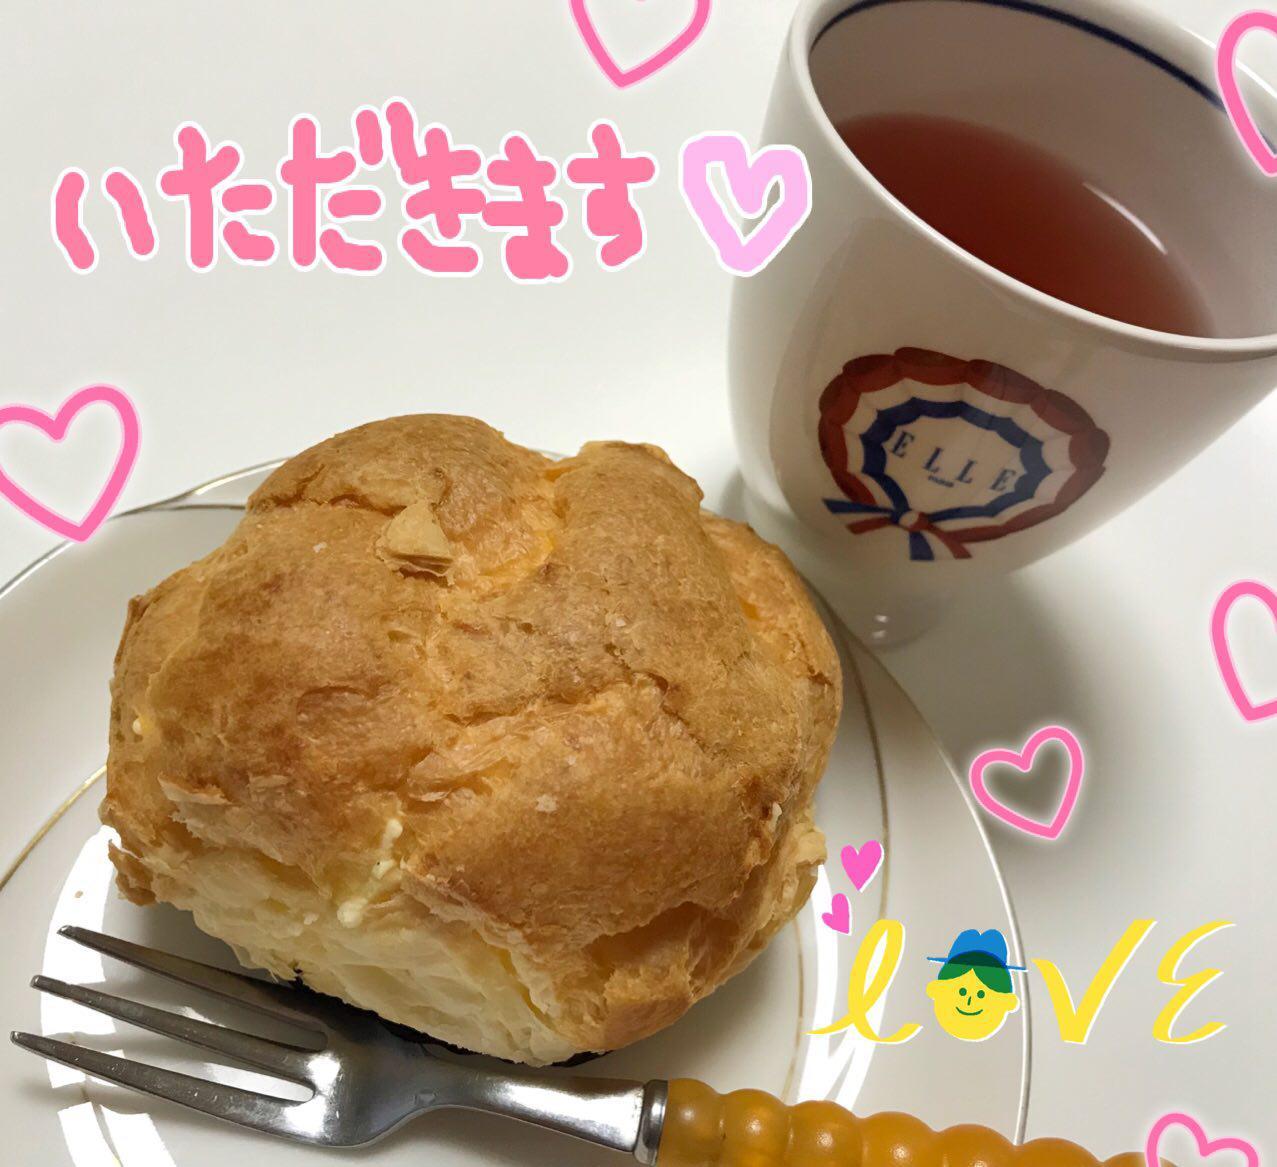 photo_2017-11-19_20-52-30.jpg